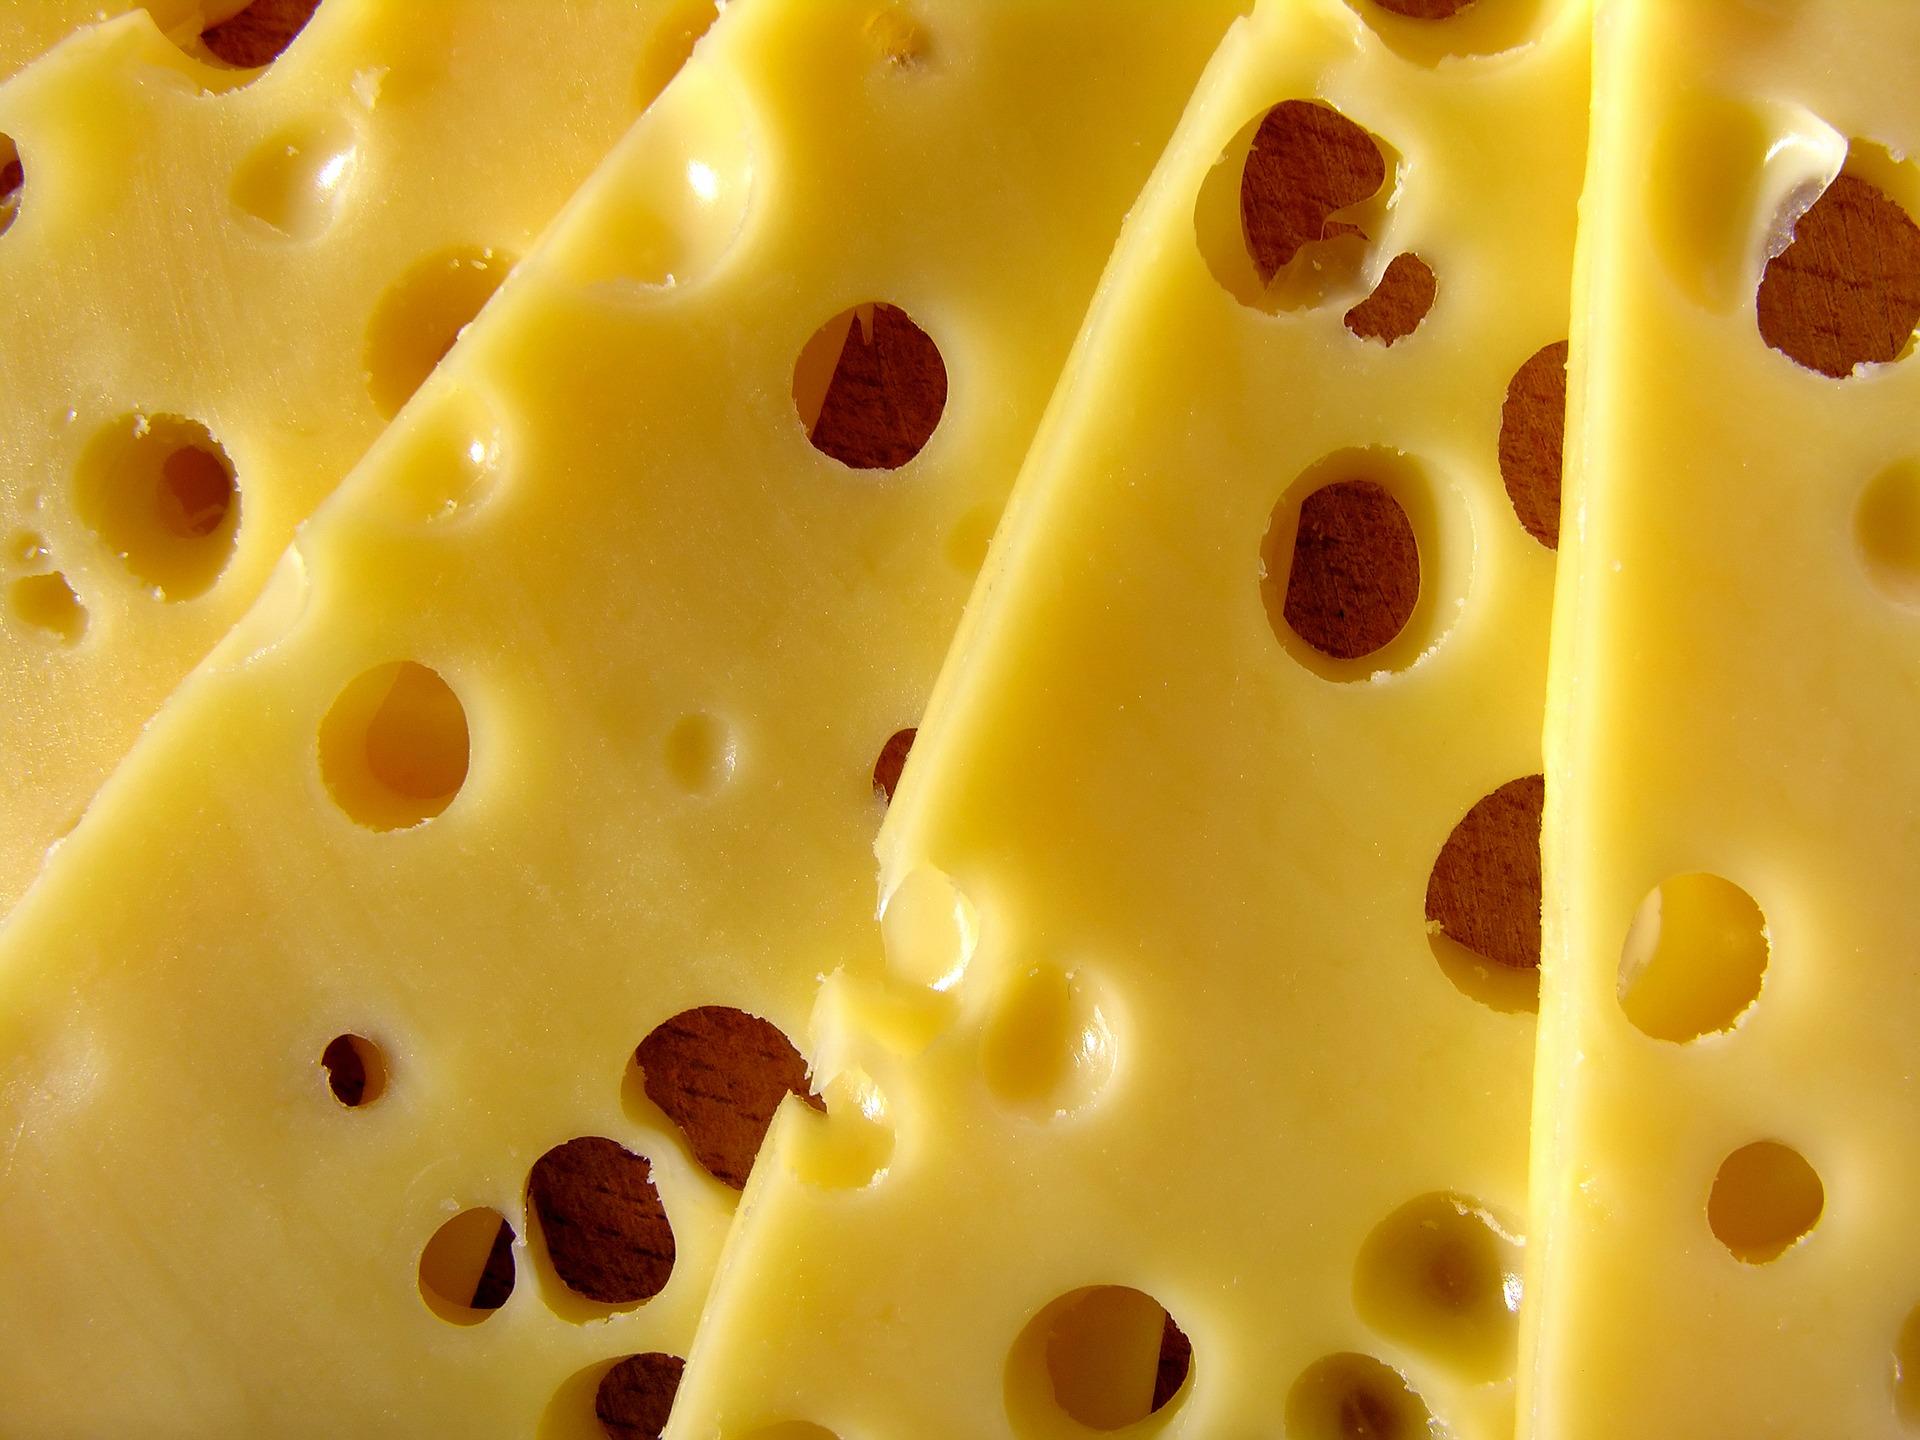 Cheese high in vitamin D